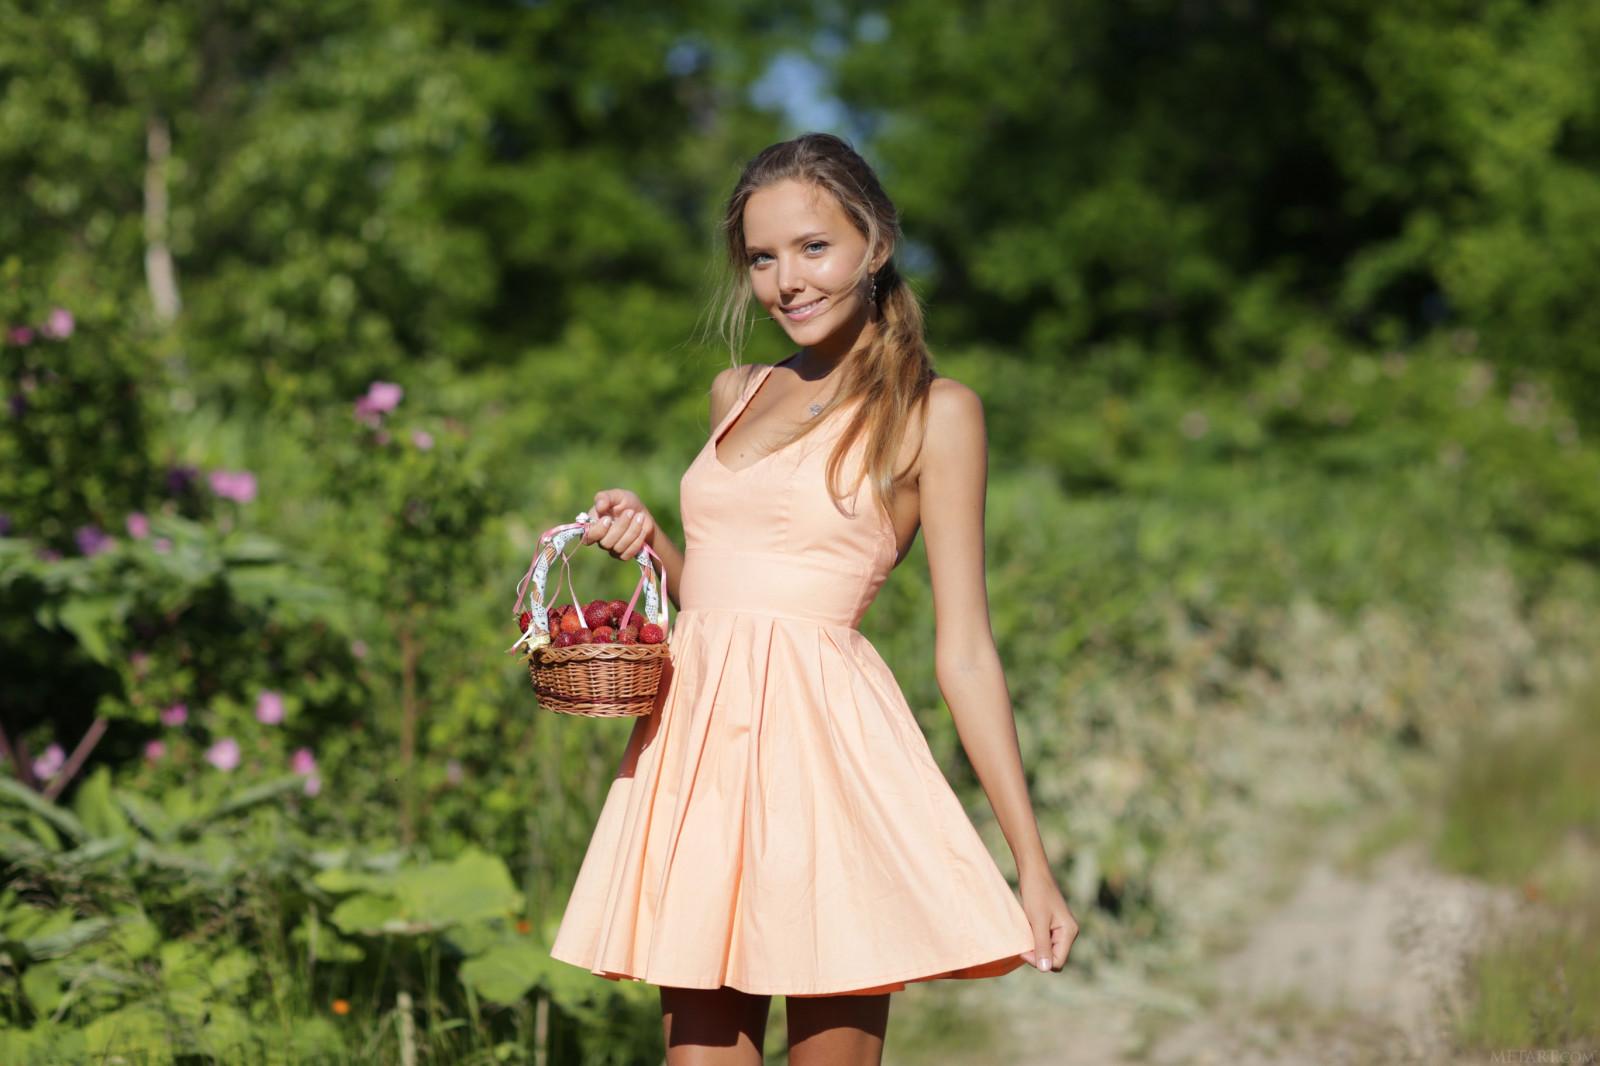 Katya Clover HD wallpapers free download | Wallpaperbetter